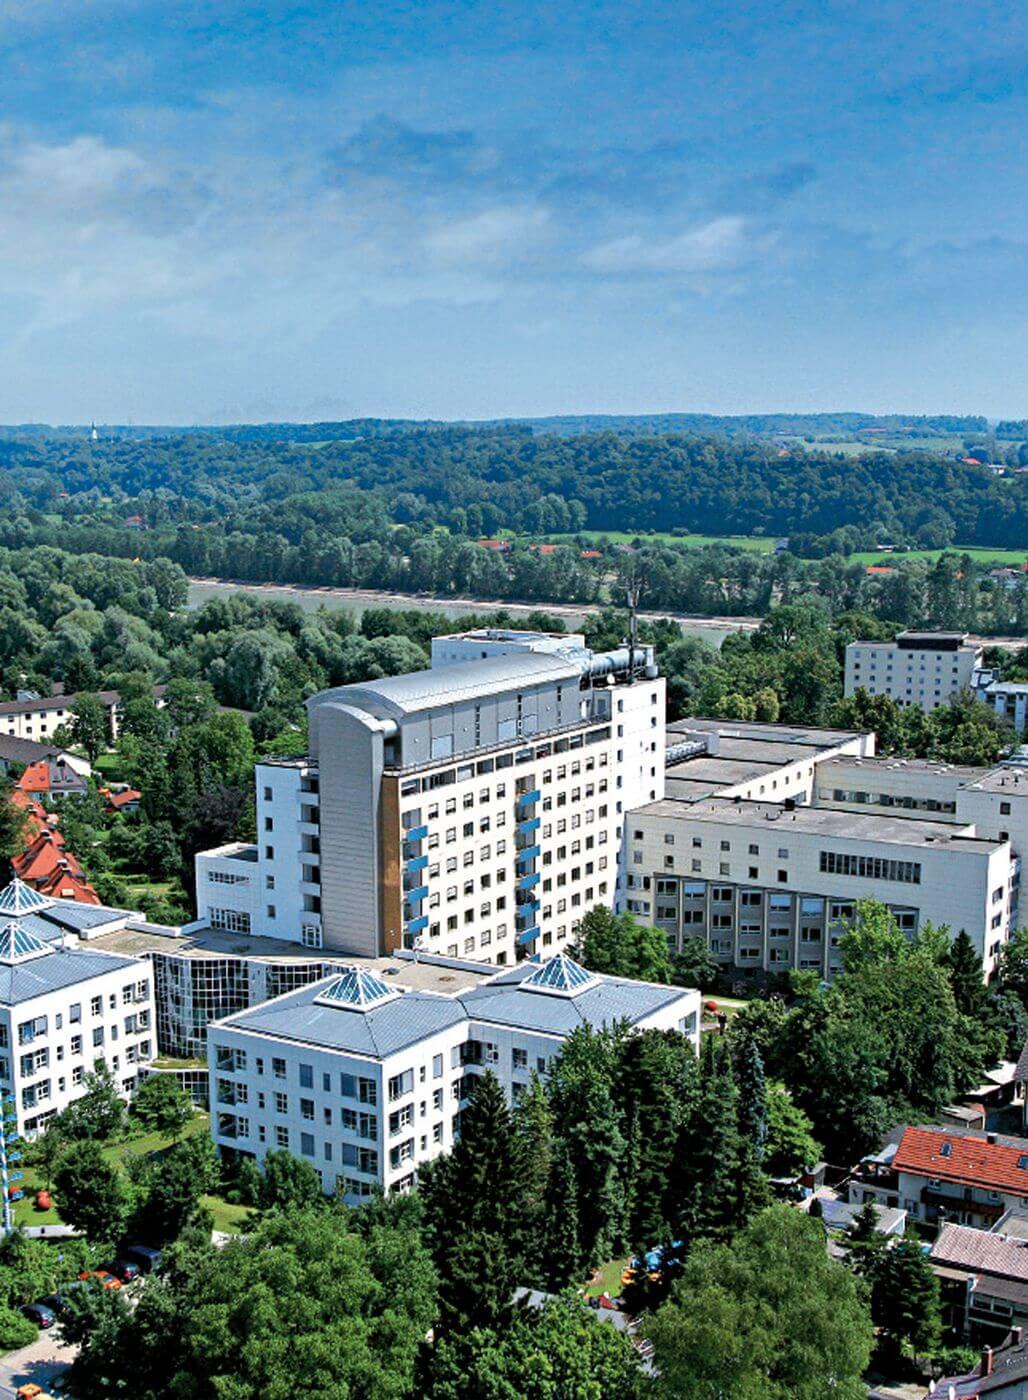 Luftbild Klinikum Rosenheim.